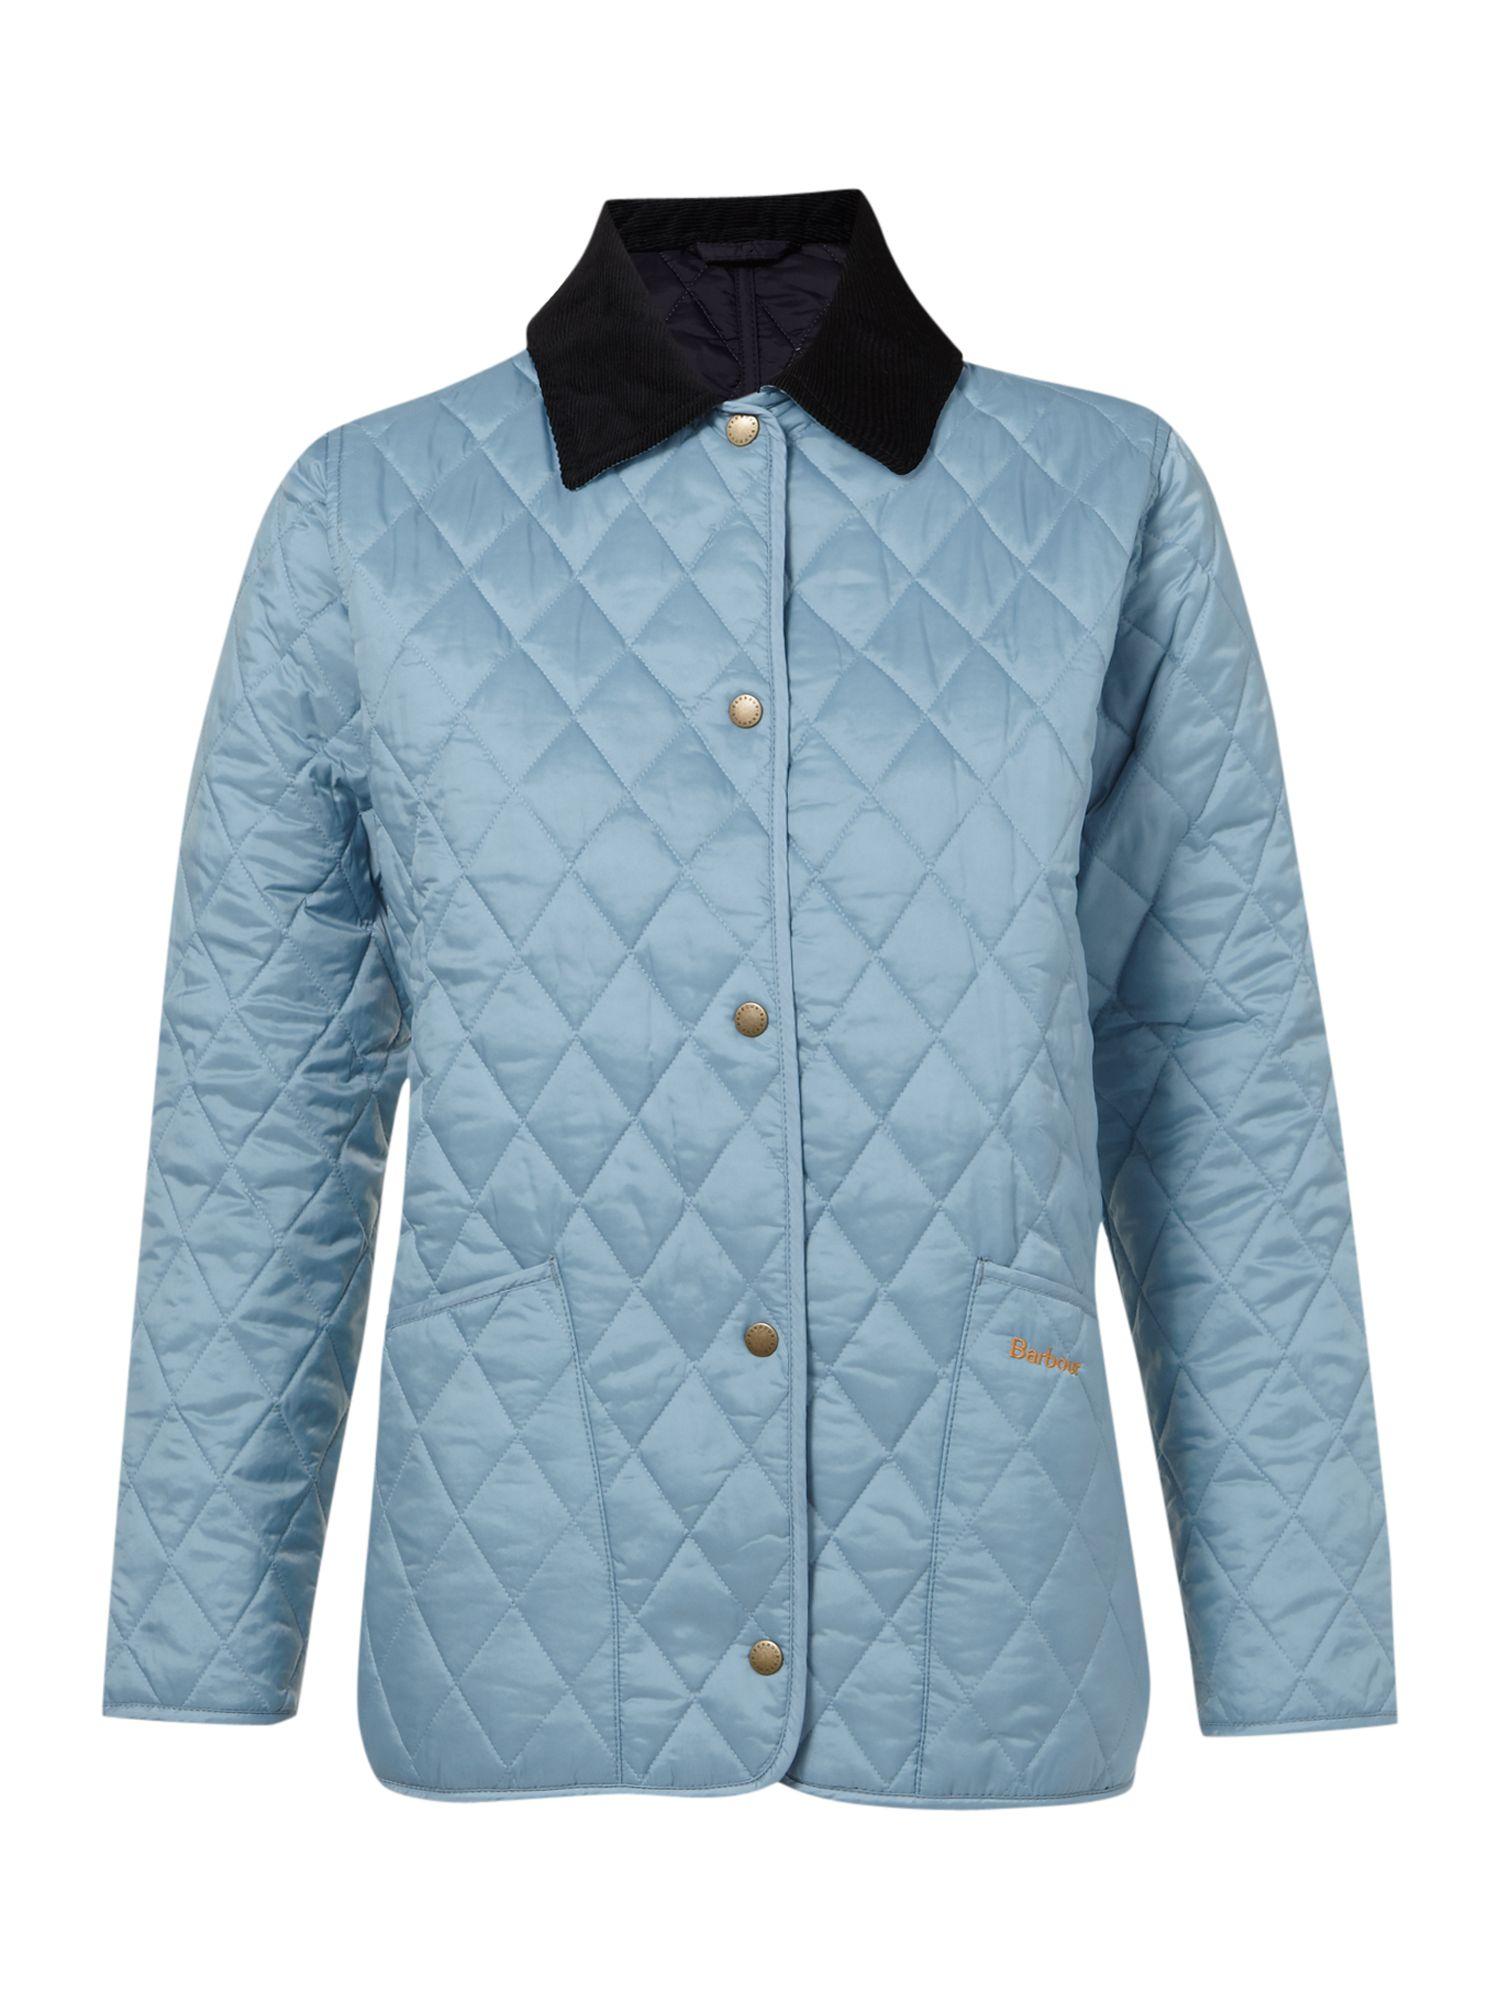 Blue barbour jacket womens